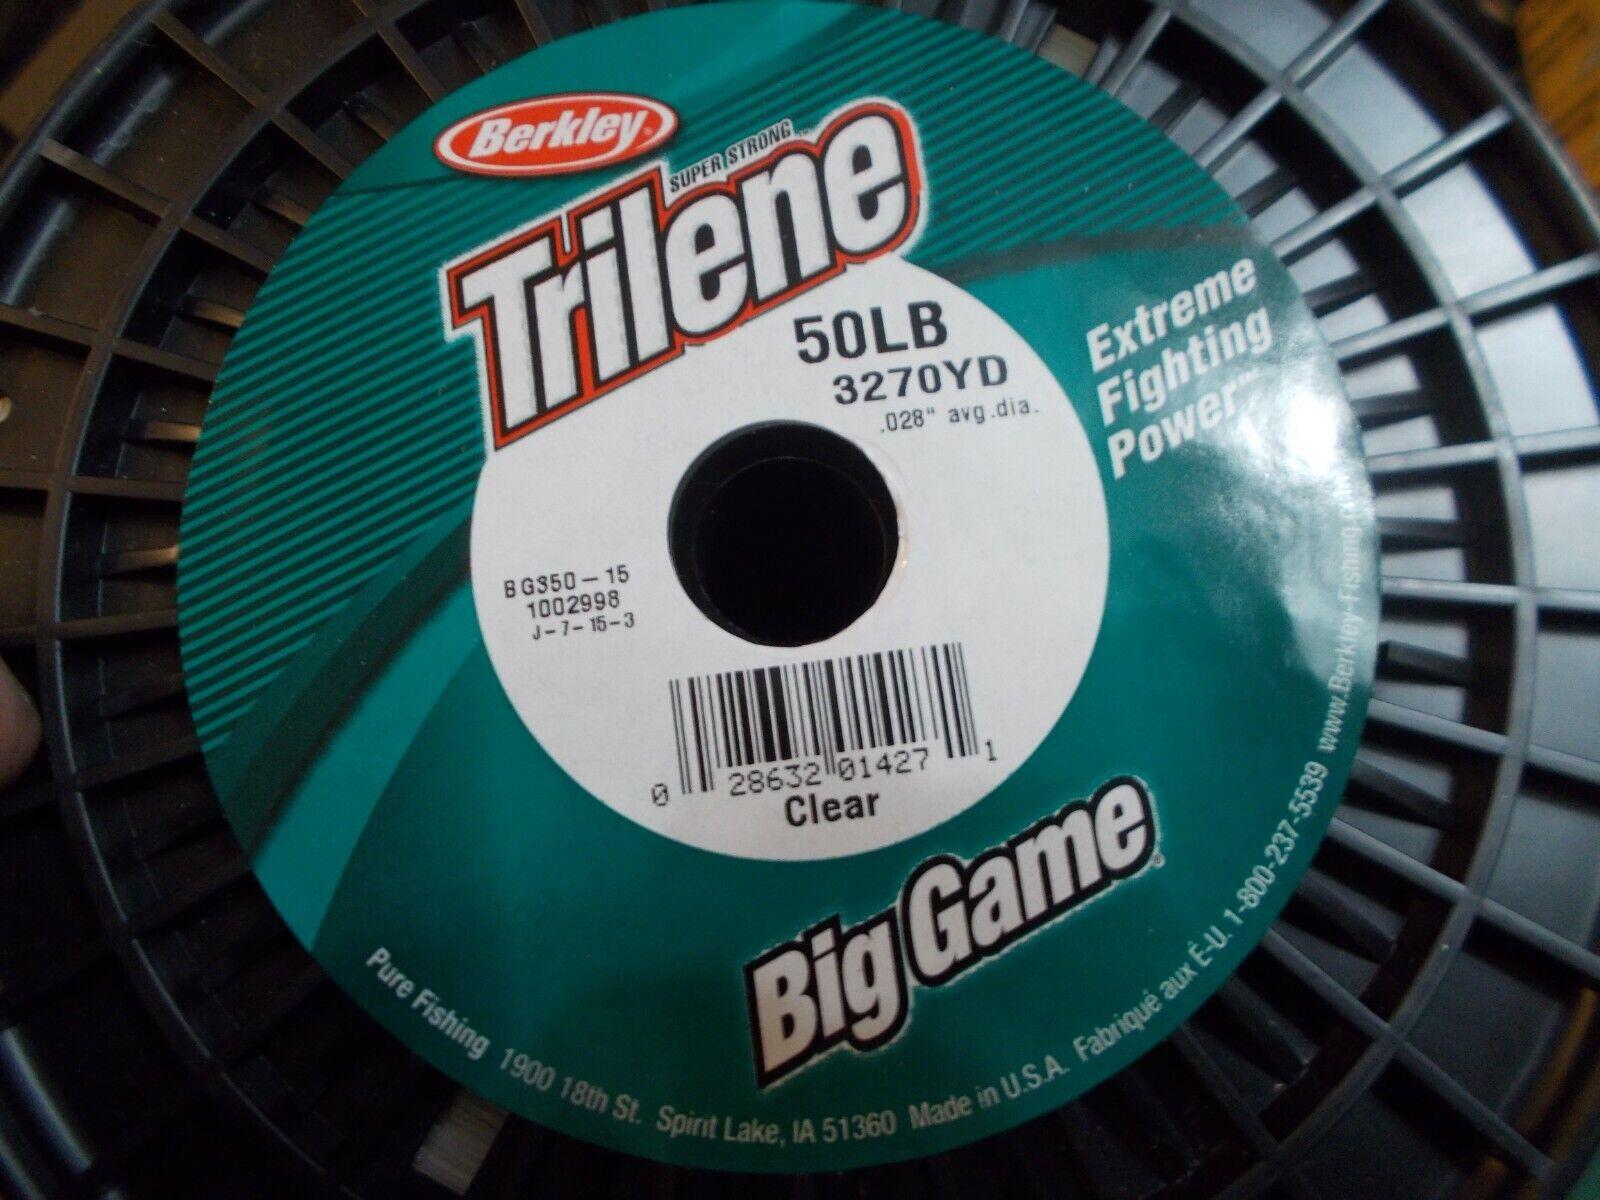 Fishing Line Berkley Big Game 50lb Test 3270yds Clear Monofilament